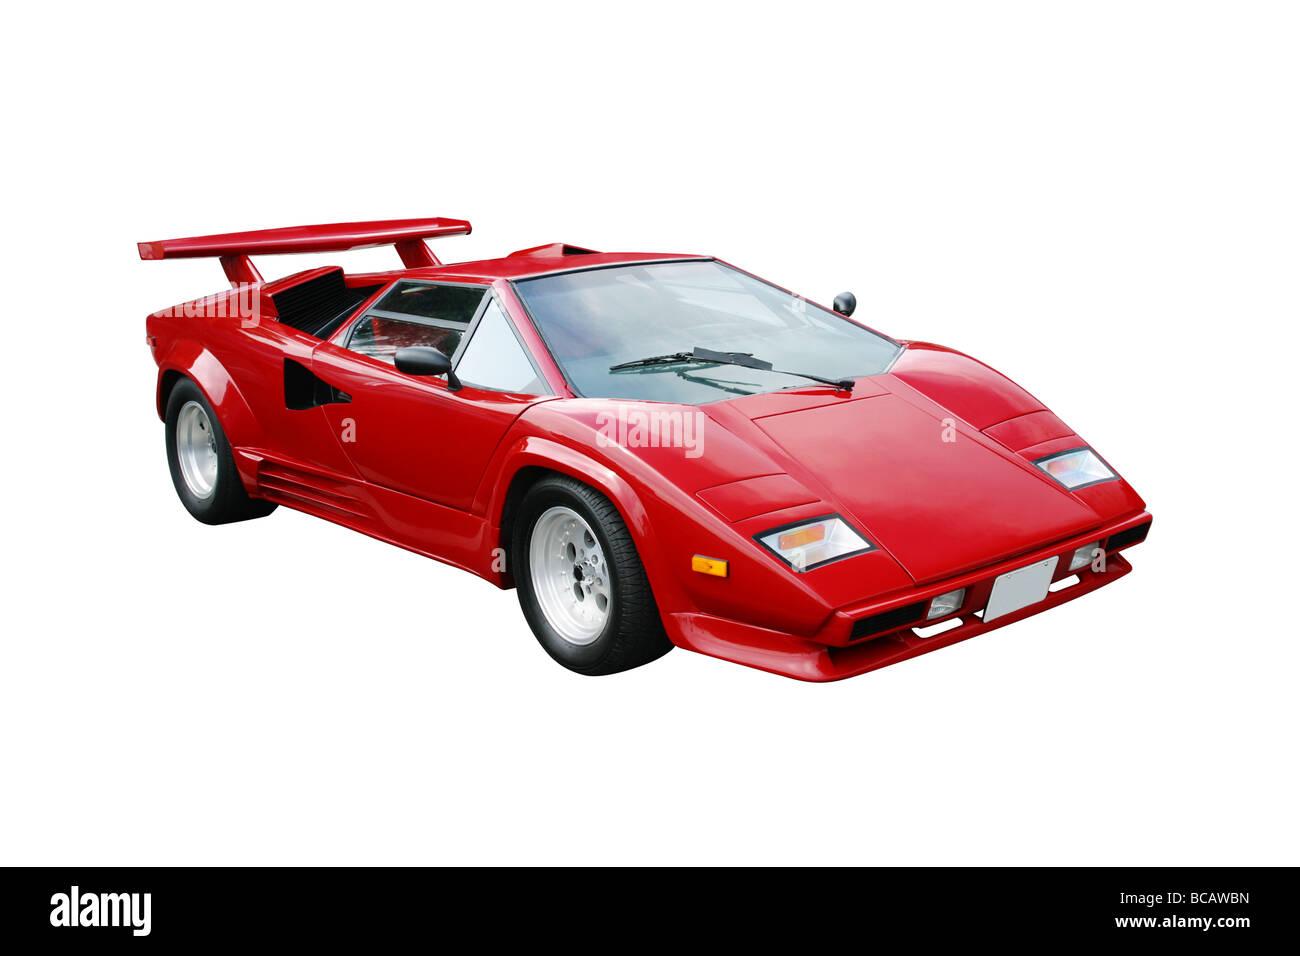 1988 Lamborghini Countach S Exotic Sports Car 1998 Kit Car Stock